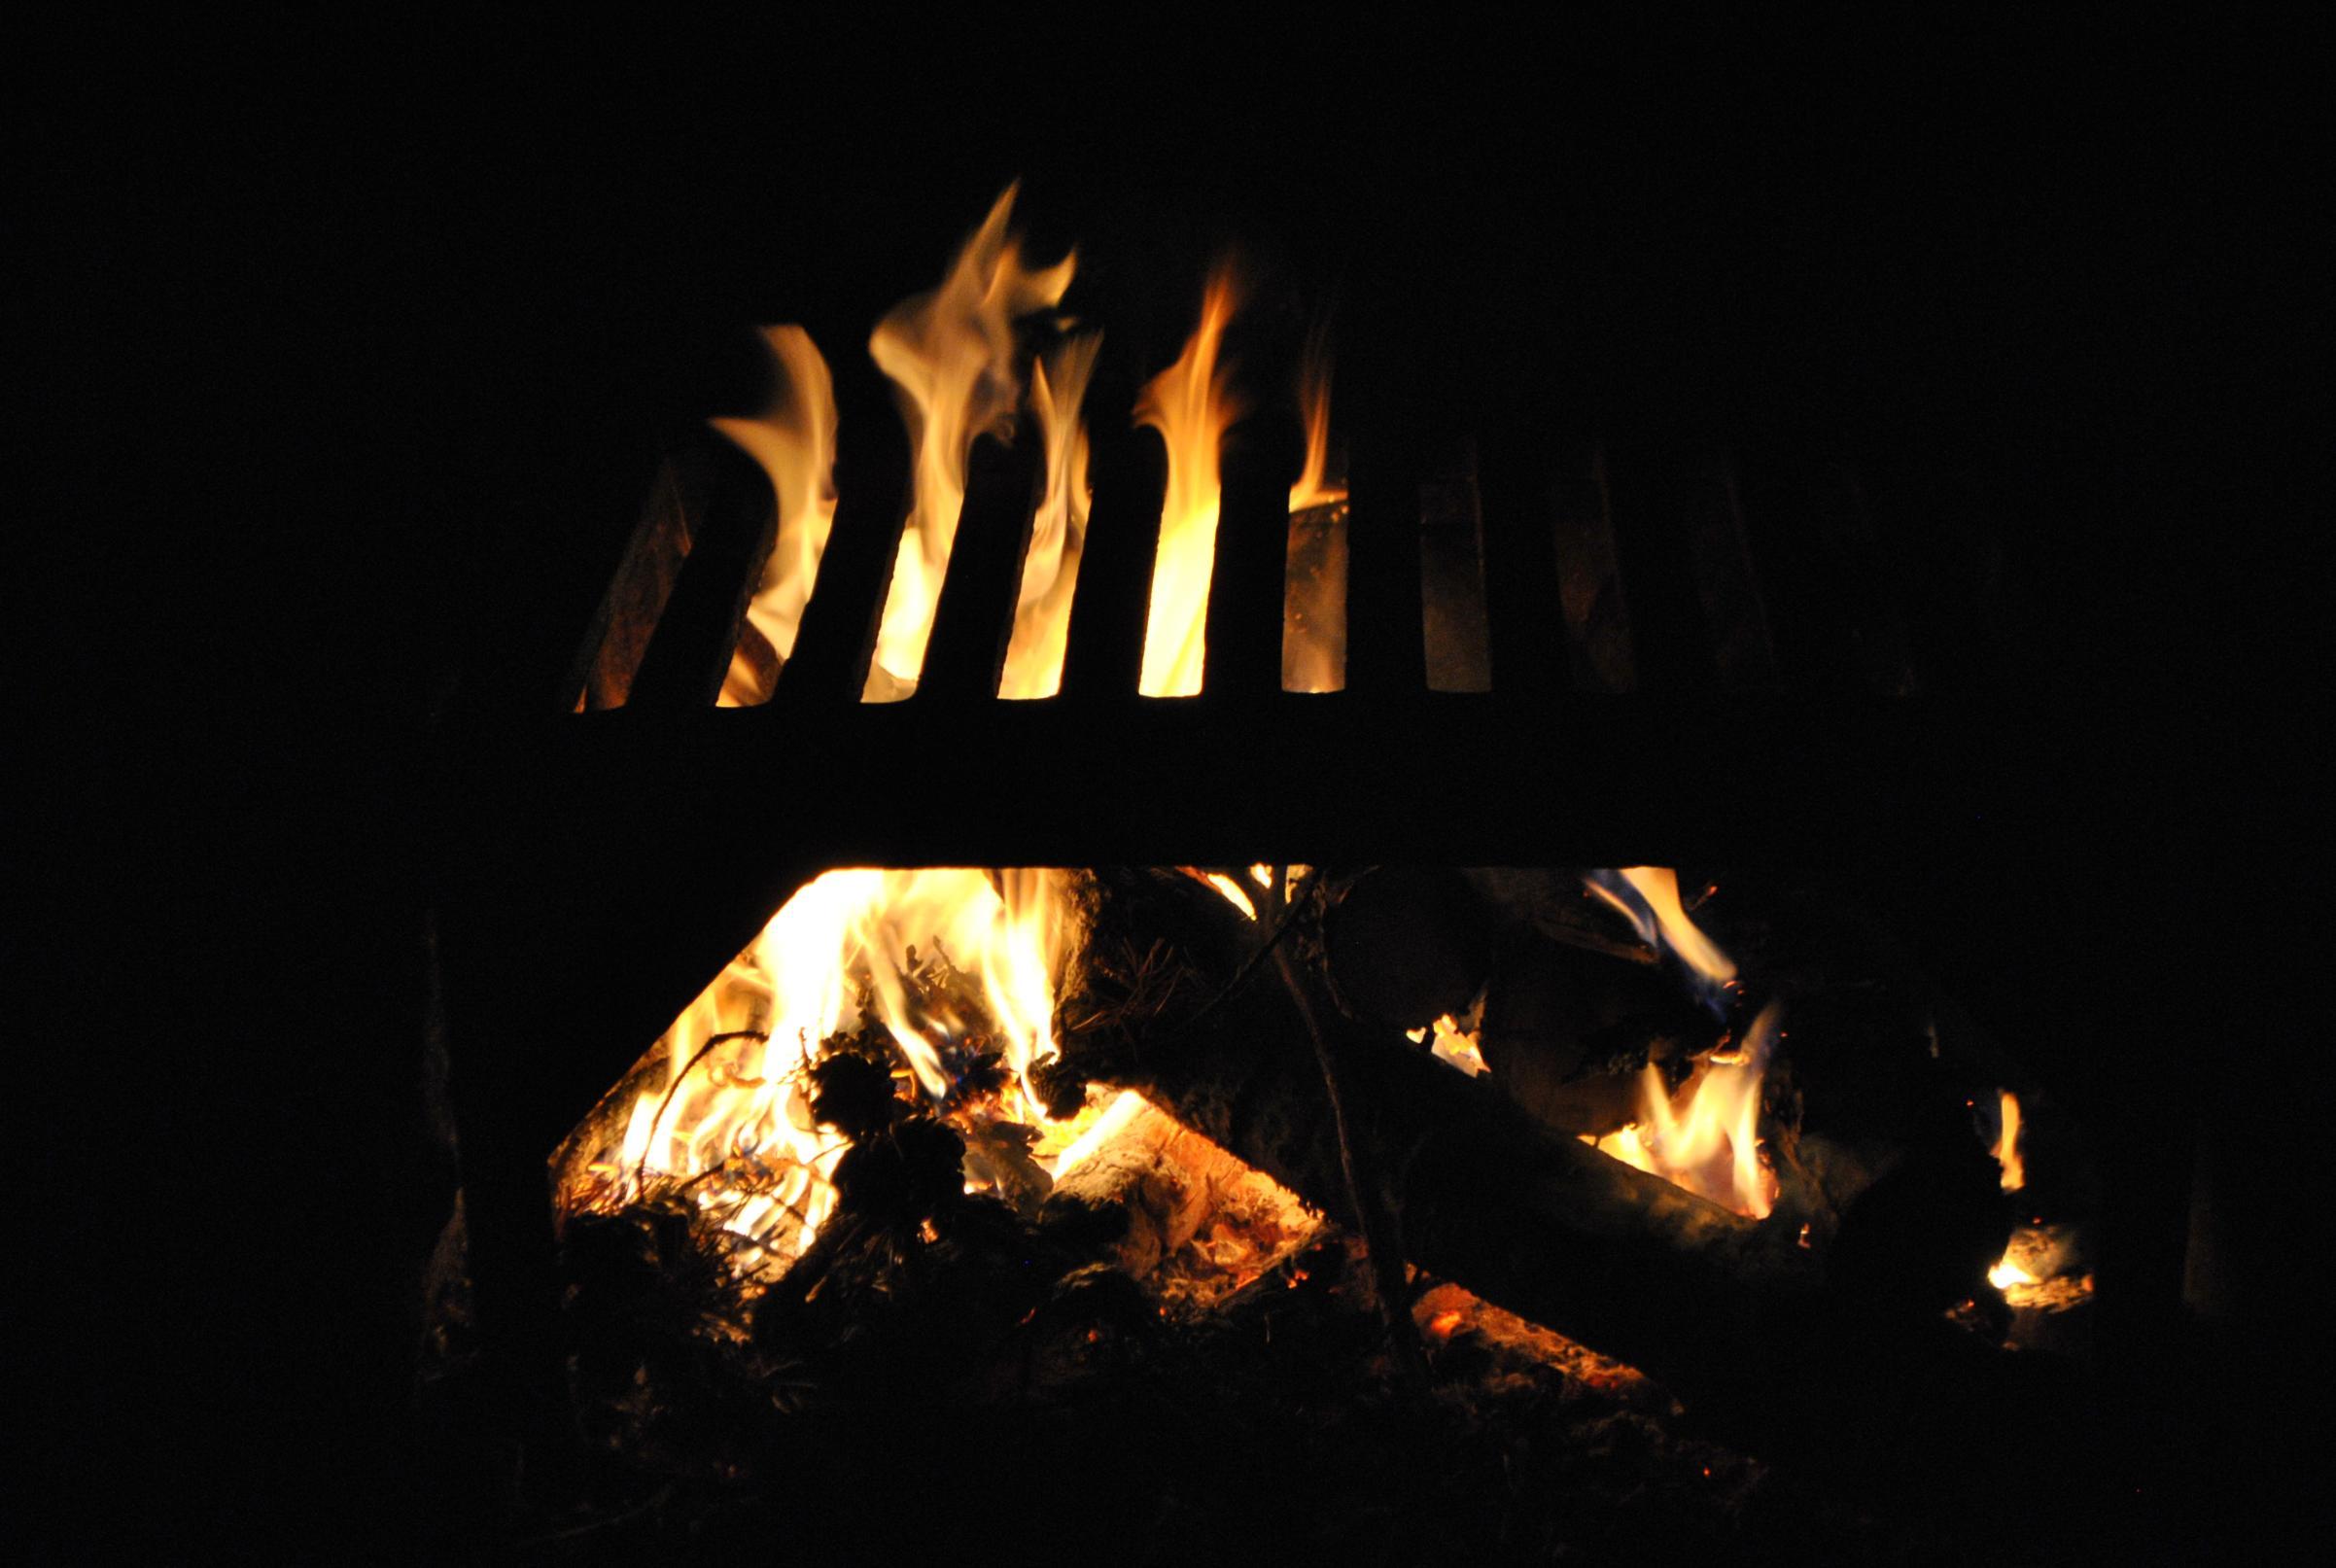 055 Fire by Night